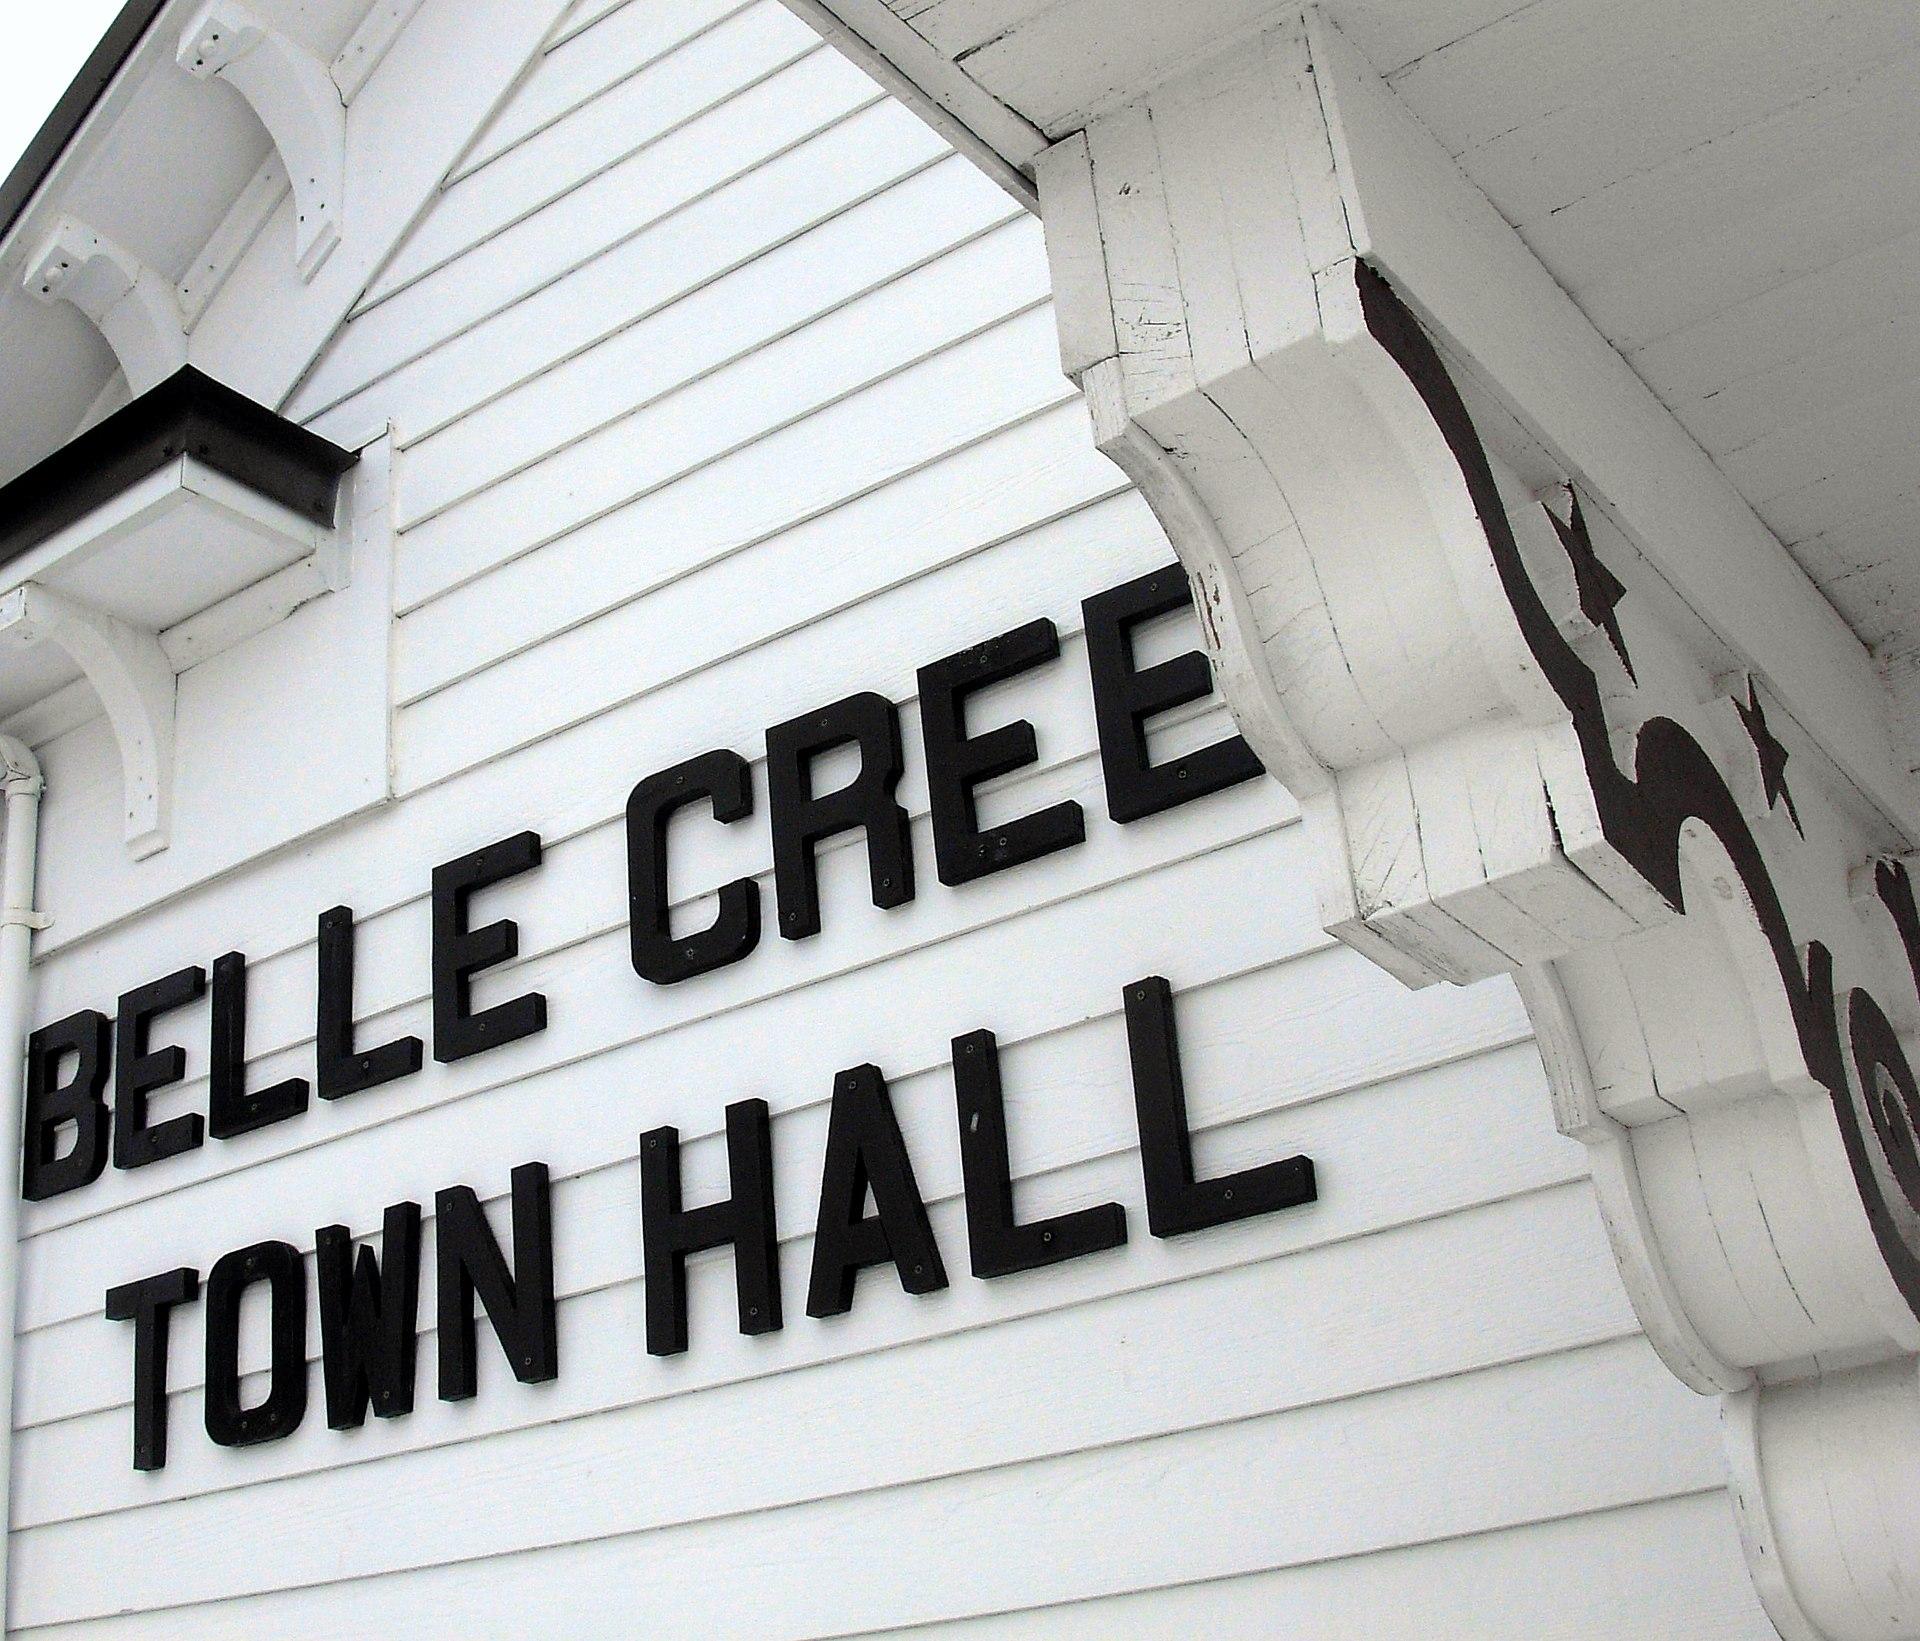 Belle creek township goodhue county minnesota wikipedia for Belle creek